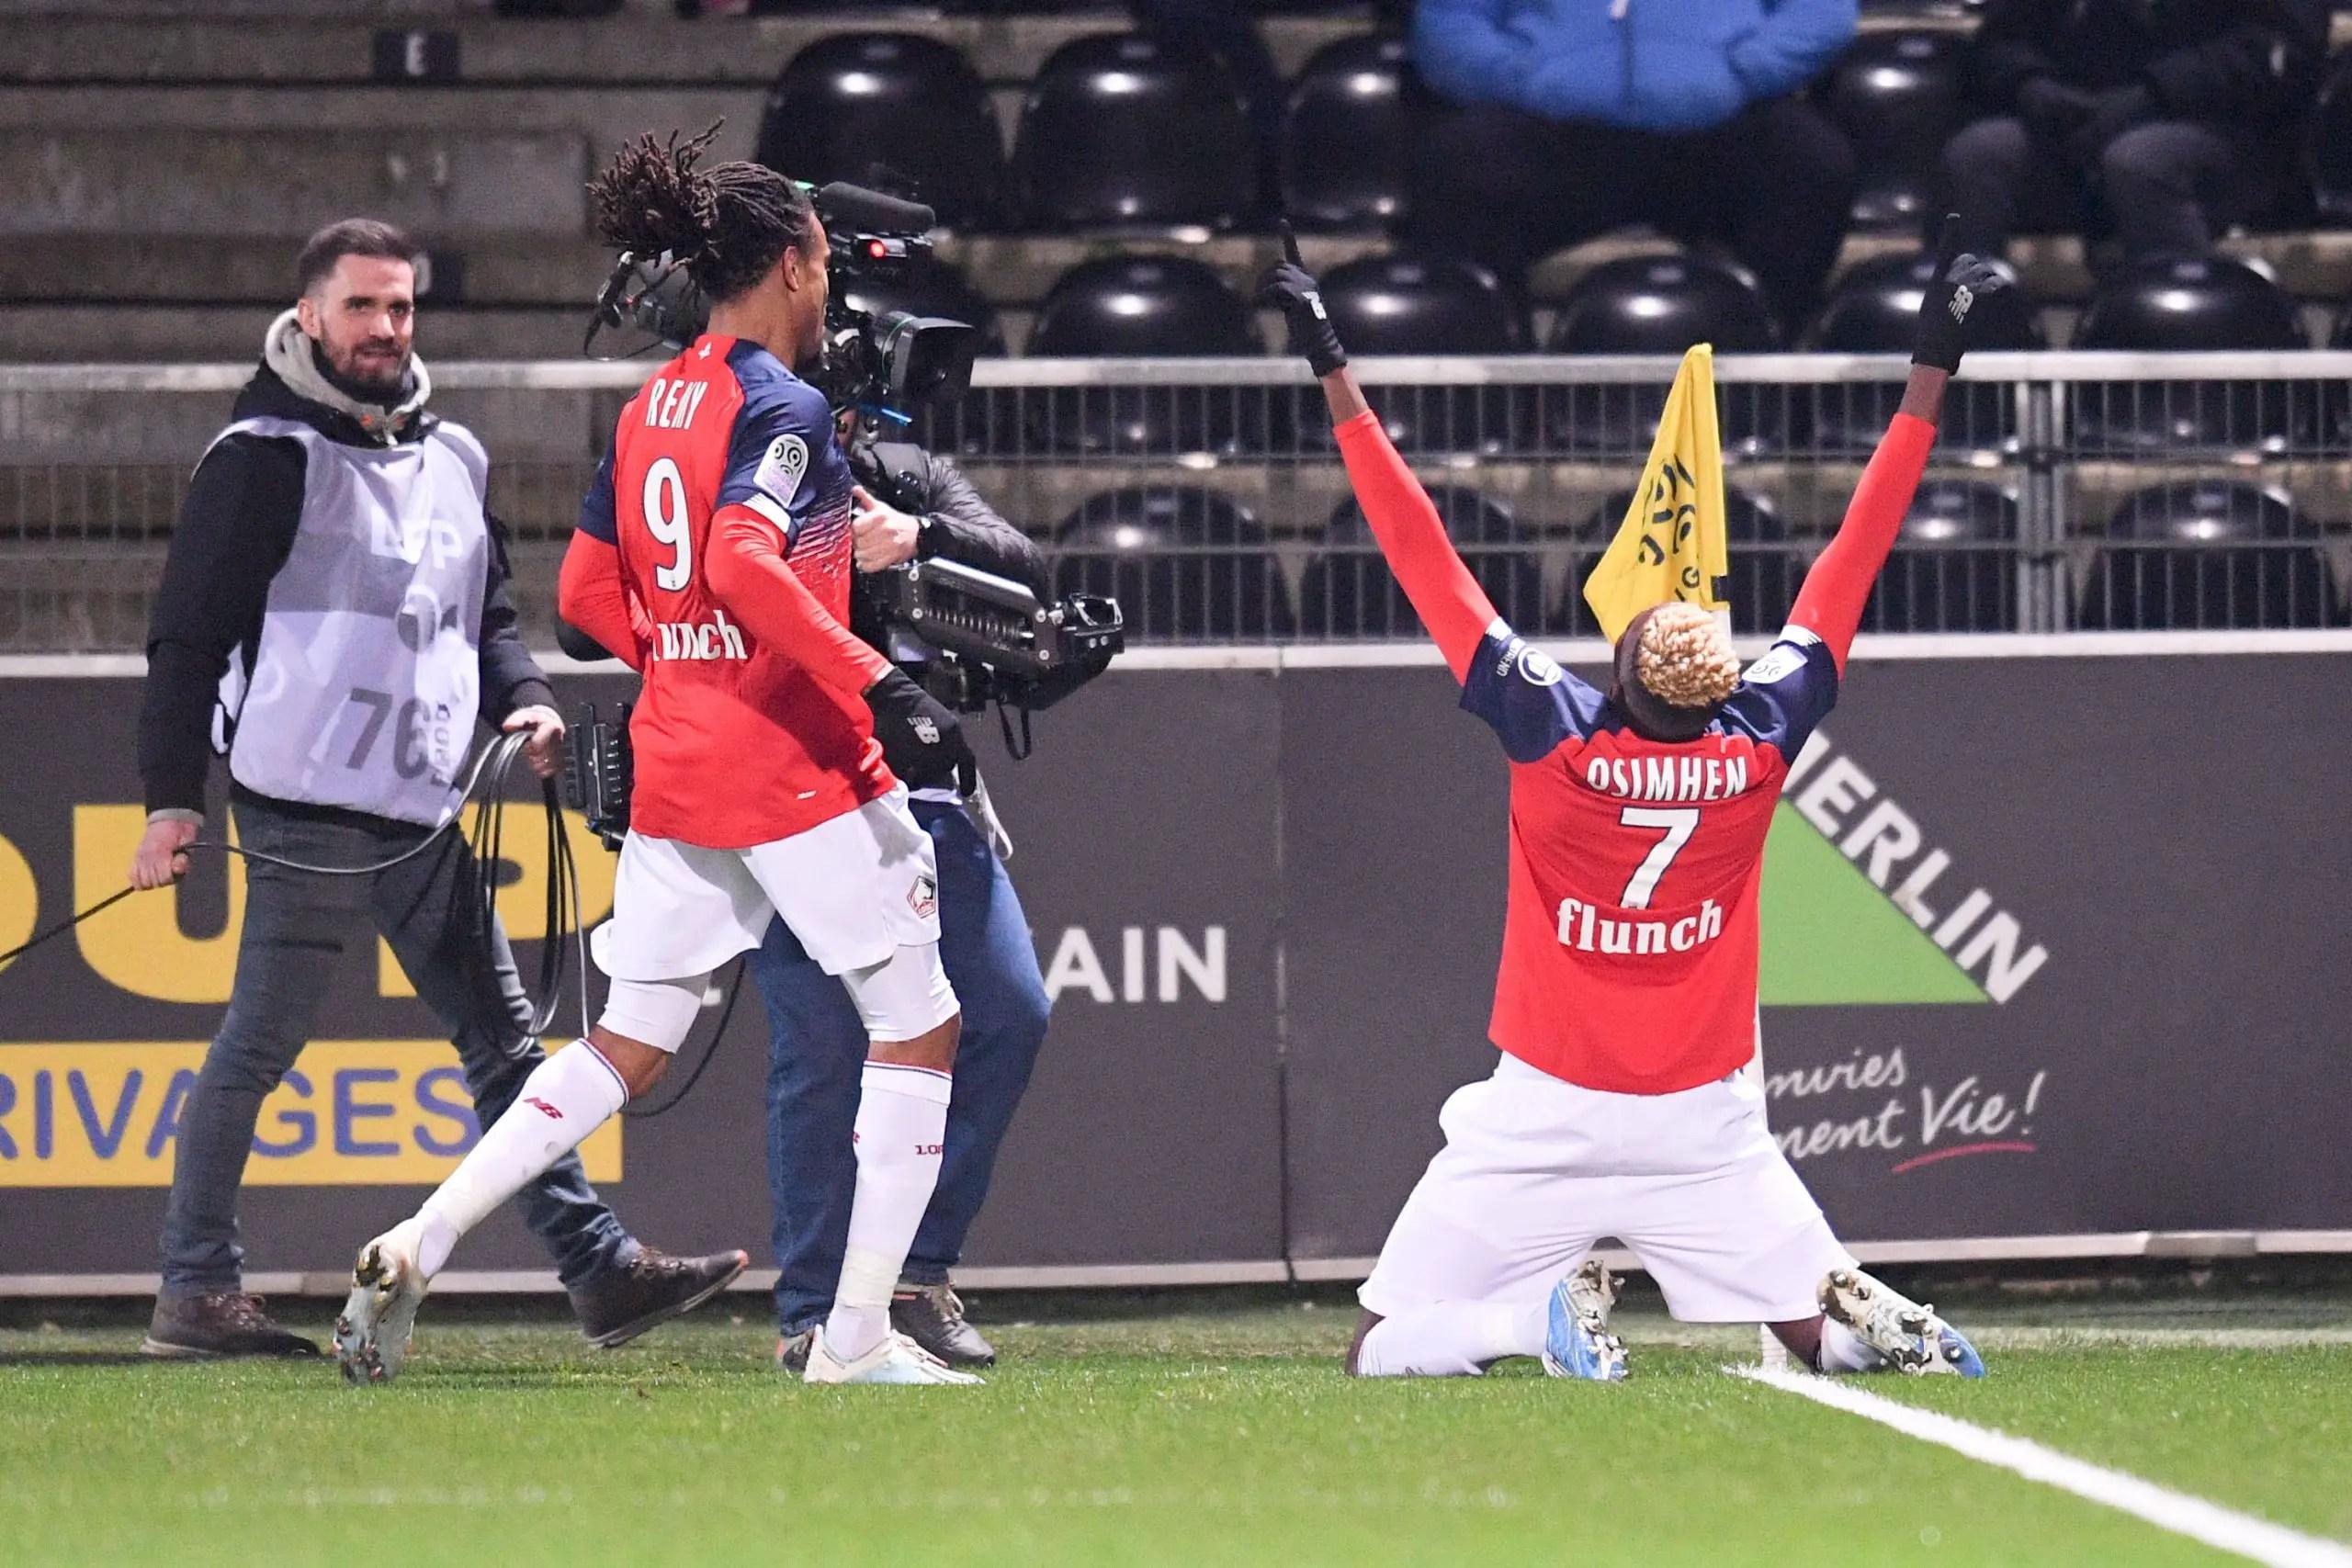 Osimhen Fit For Marseille Clash- Galtier